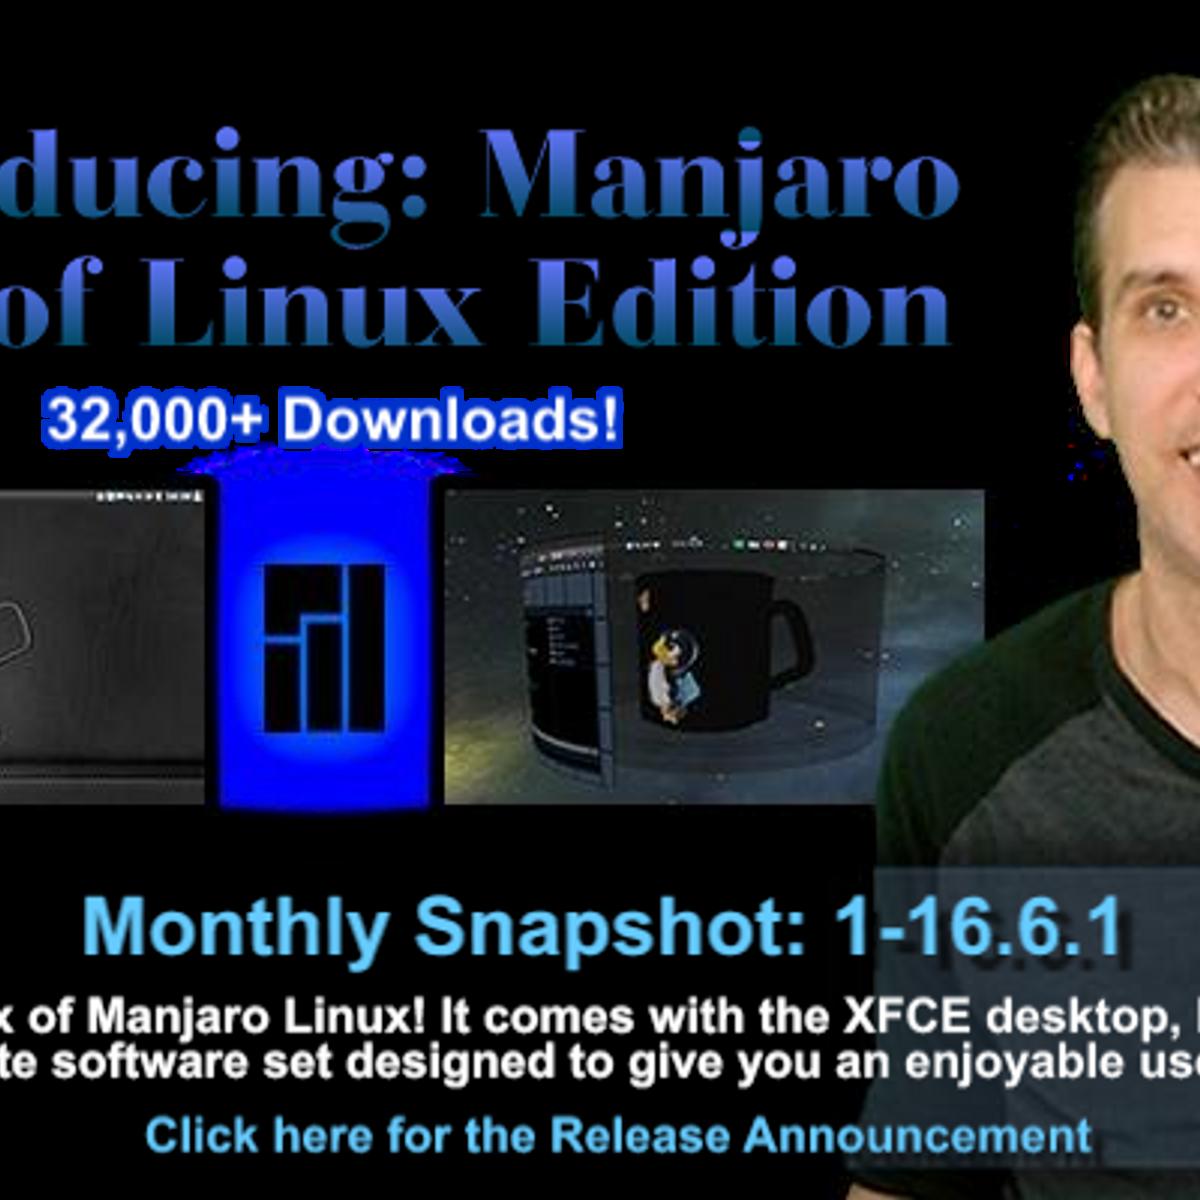 Manjaro Cup of Linux Edition Alternatives and Similar